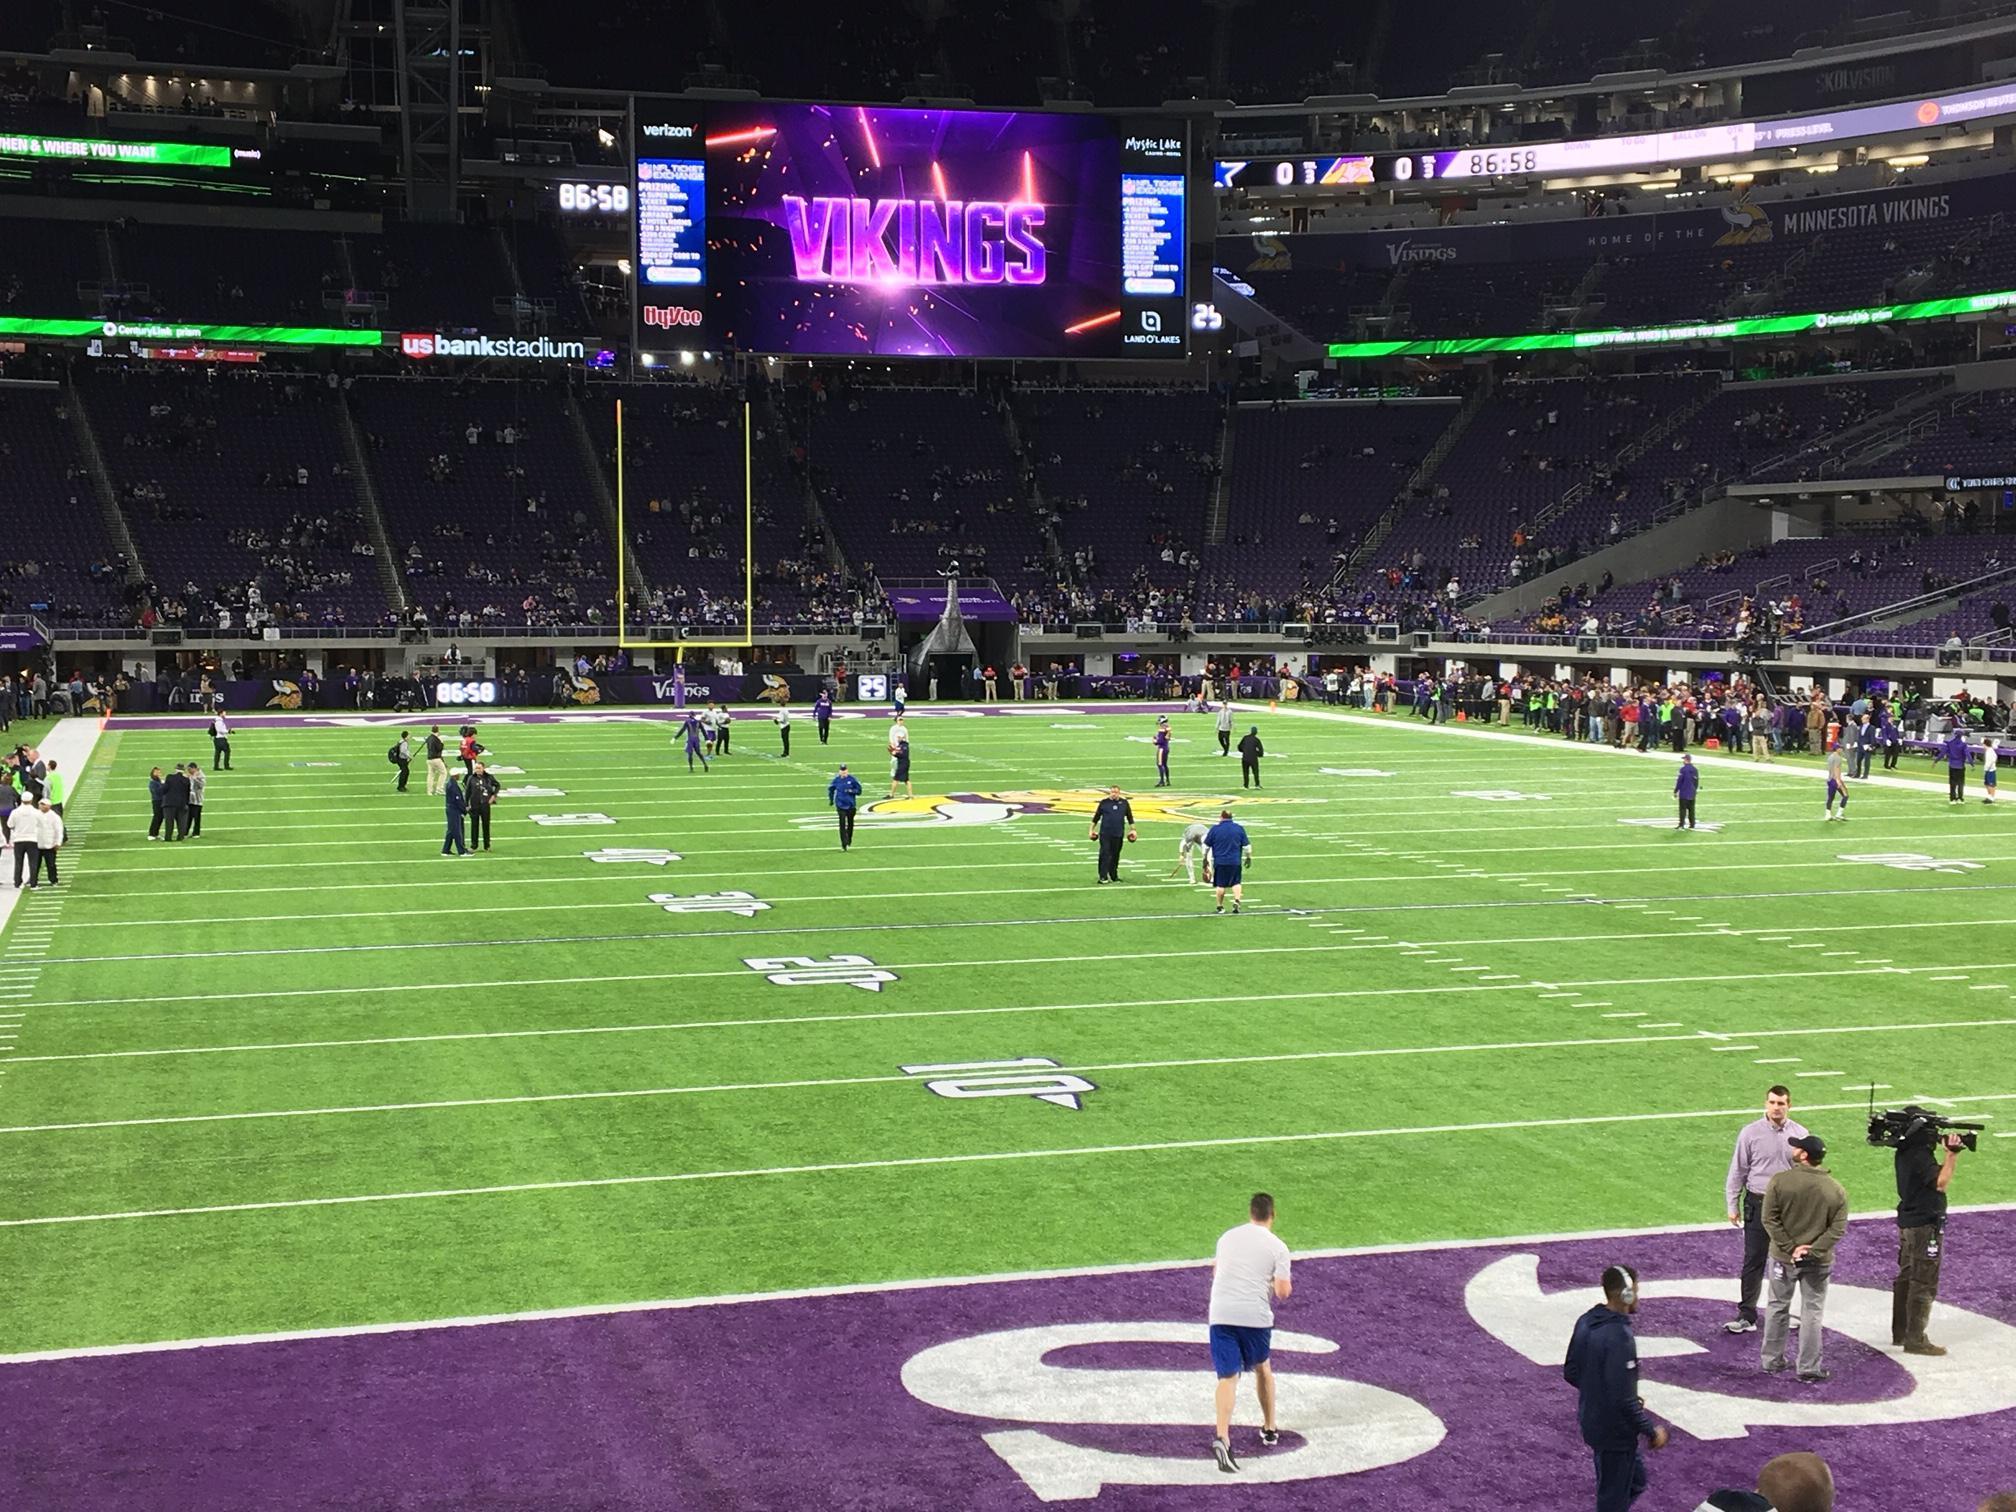 U.S. Bank Stadium Section 143 Row 8 Seat 20